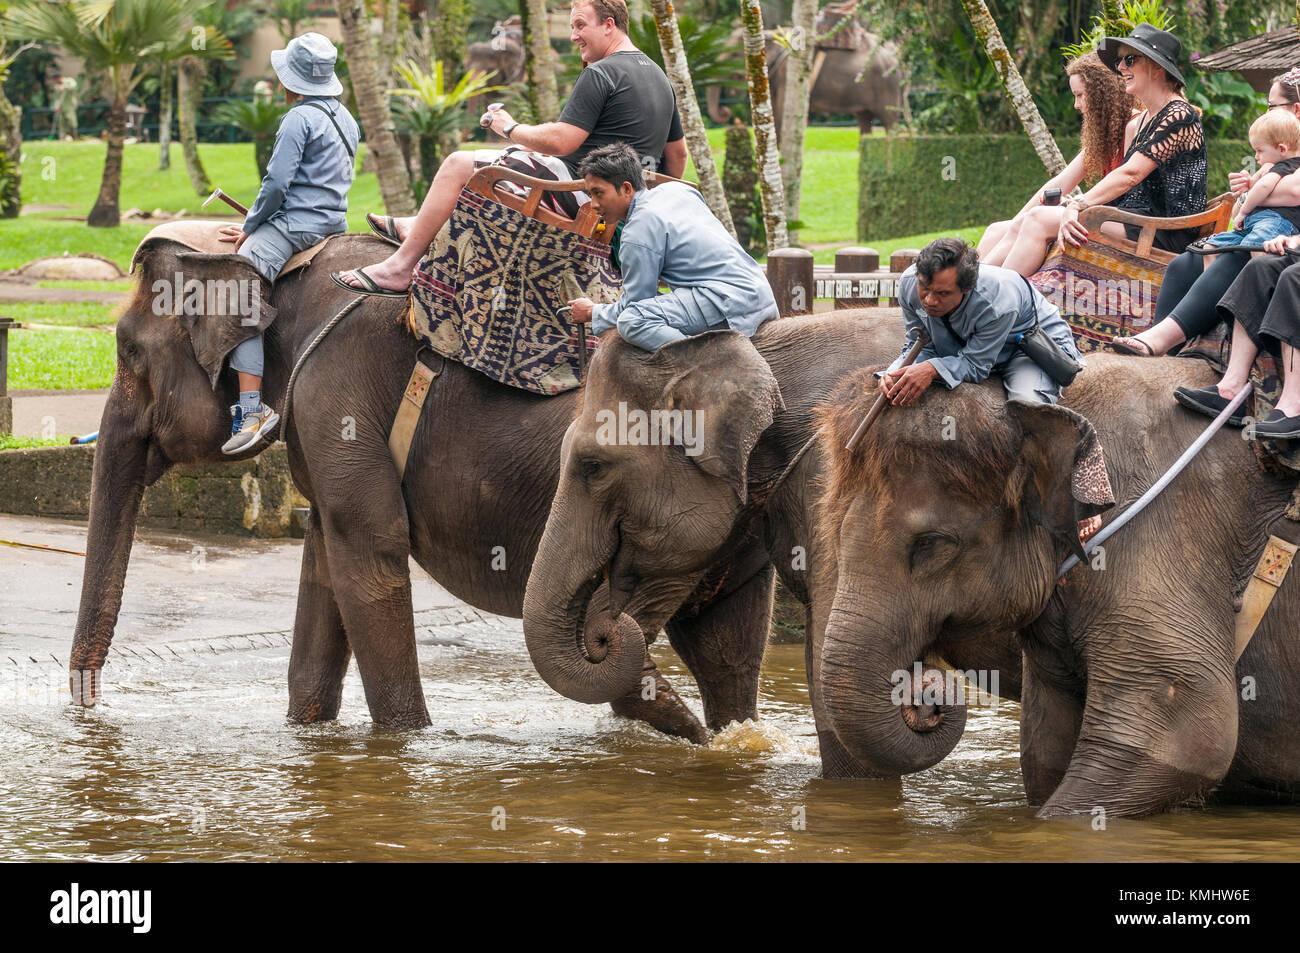 Tourists and handlers riding rescued Sumatran elephants at the Elephant Safari Park at Taro, Bali, Indonesia - Stock Image